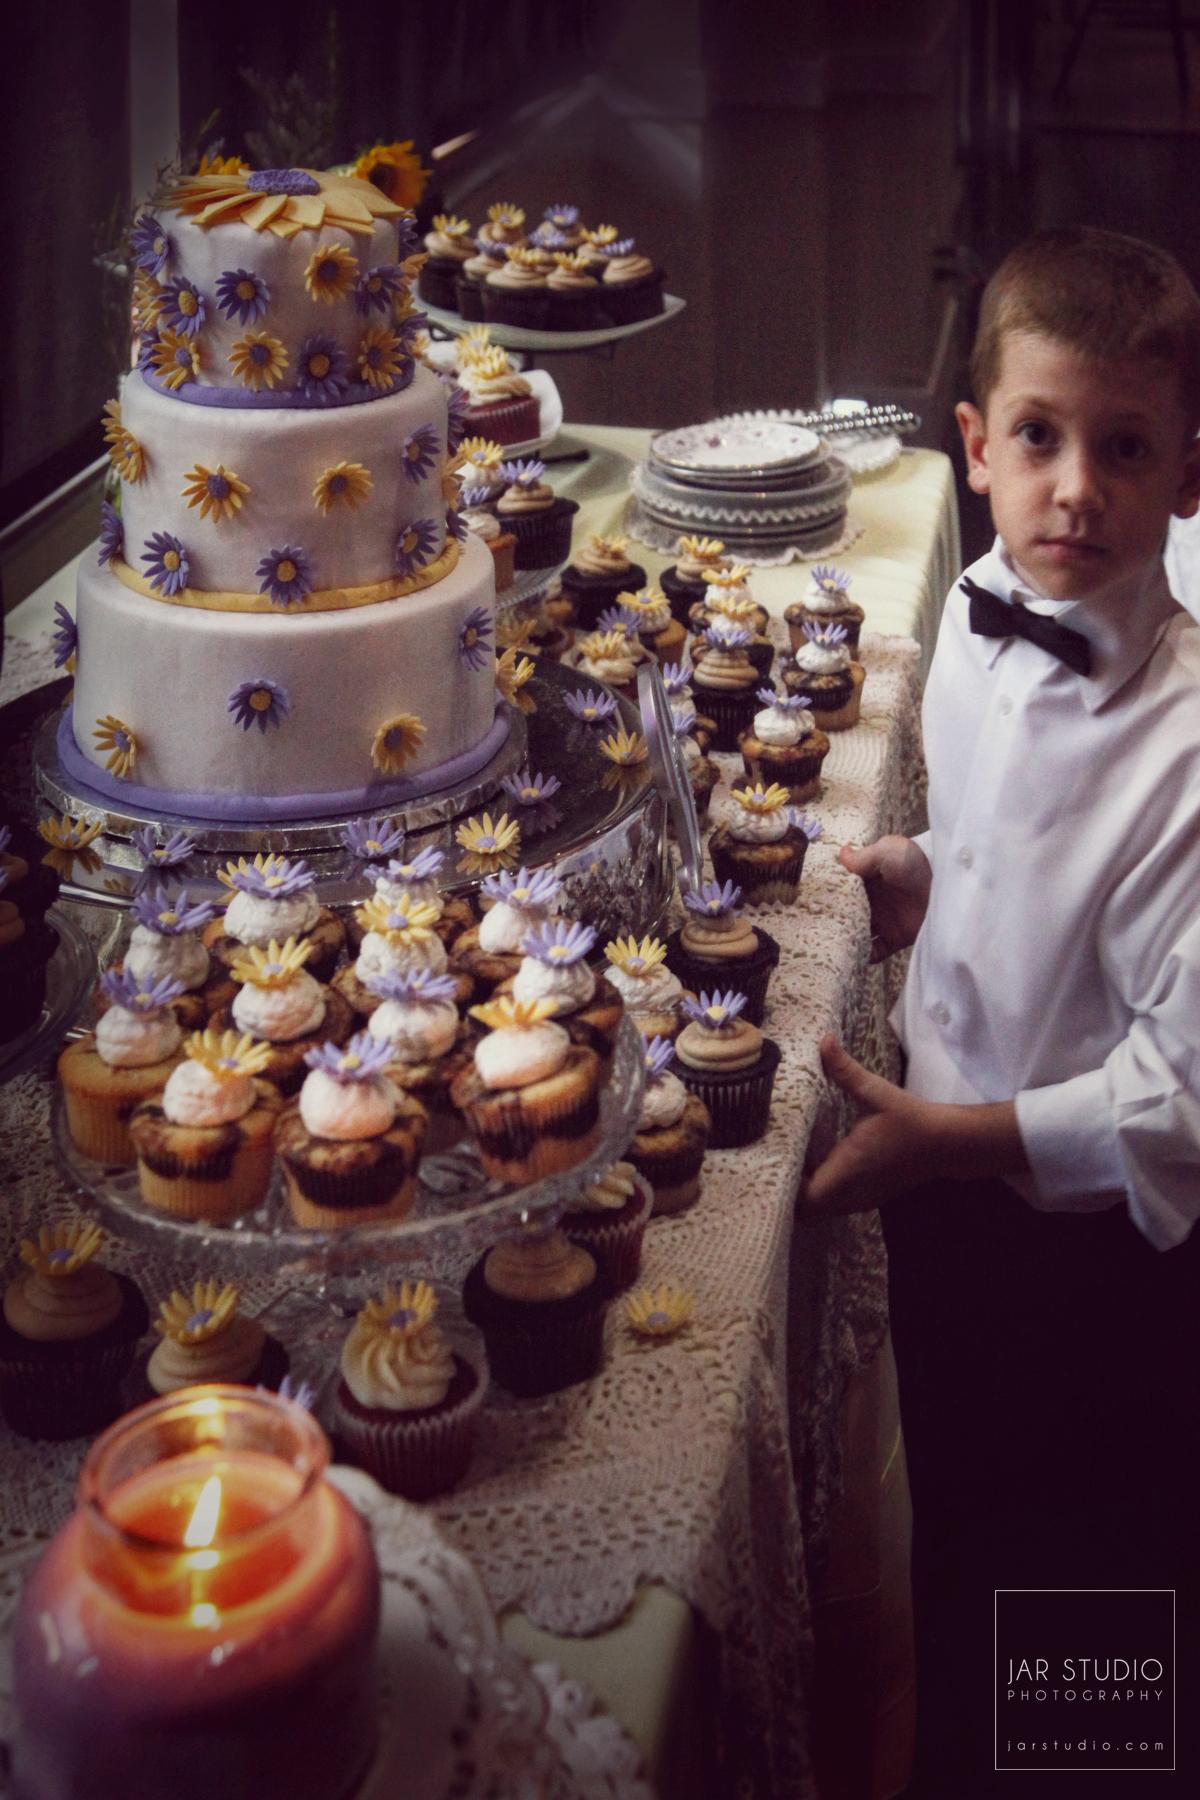 23-sunflowers-wedding-cake-dessert-table-jarstudio-photography.JPG